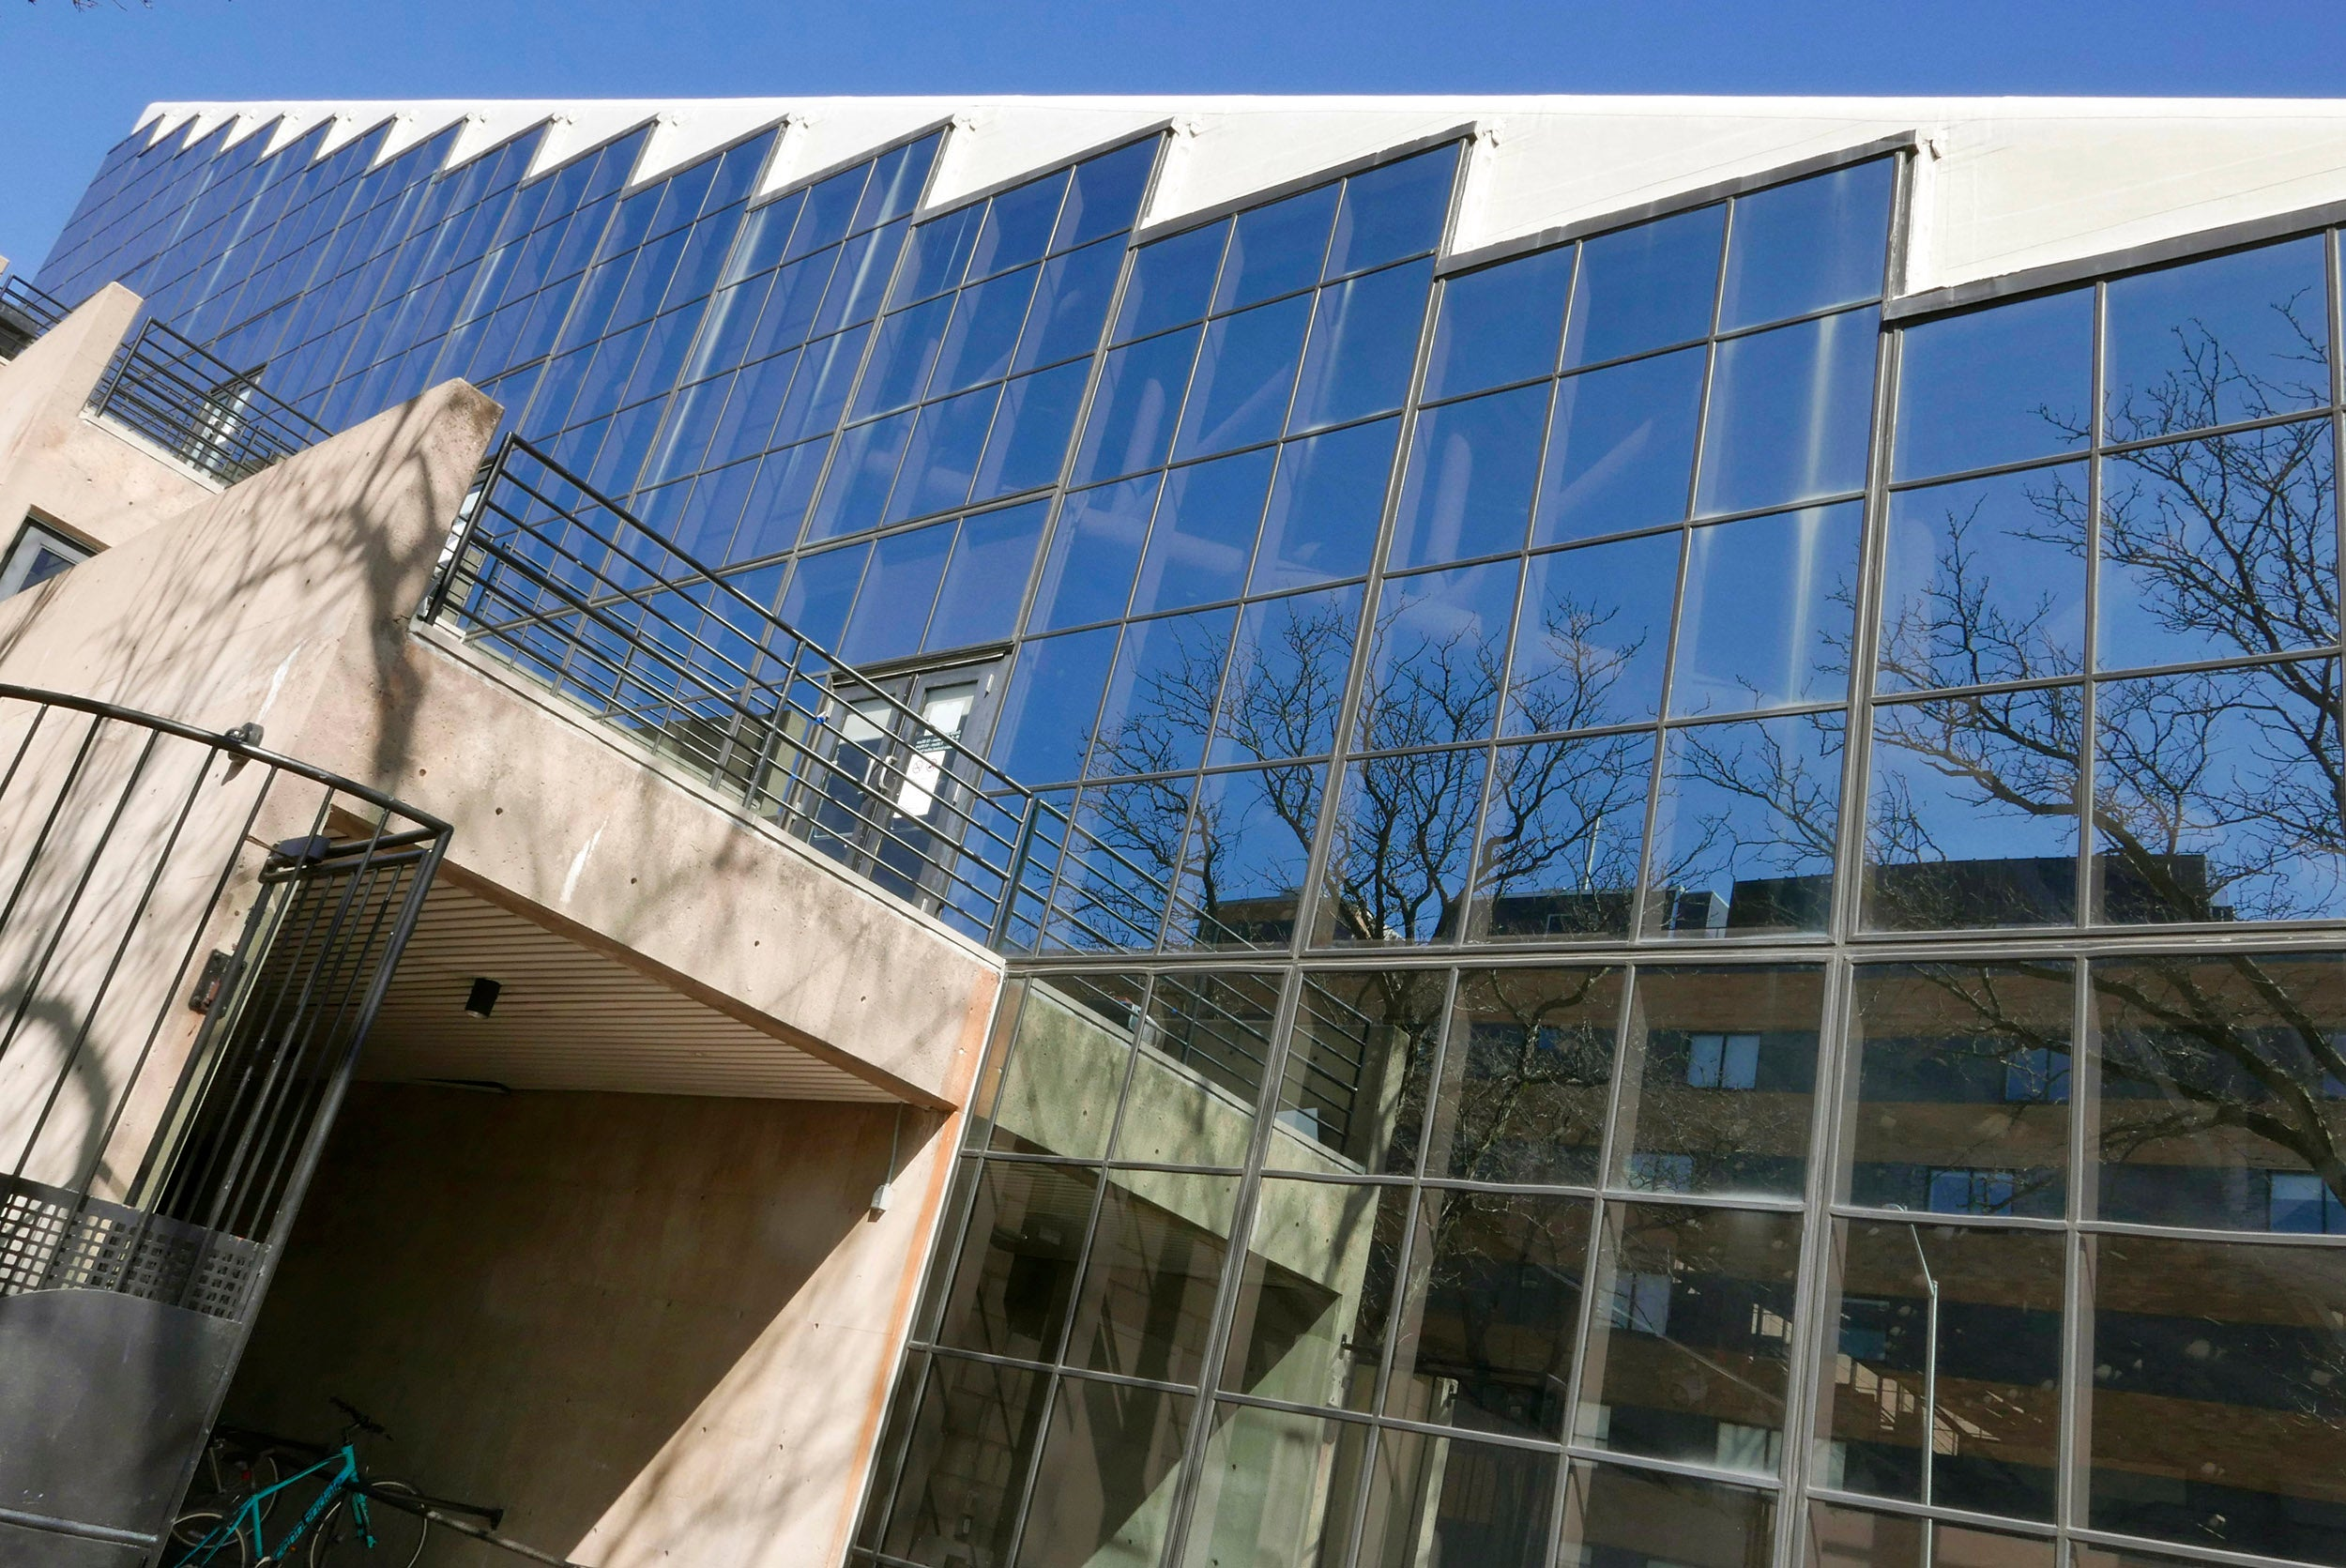 Gund Hall at Harvard School of Graduate Design.